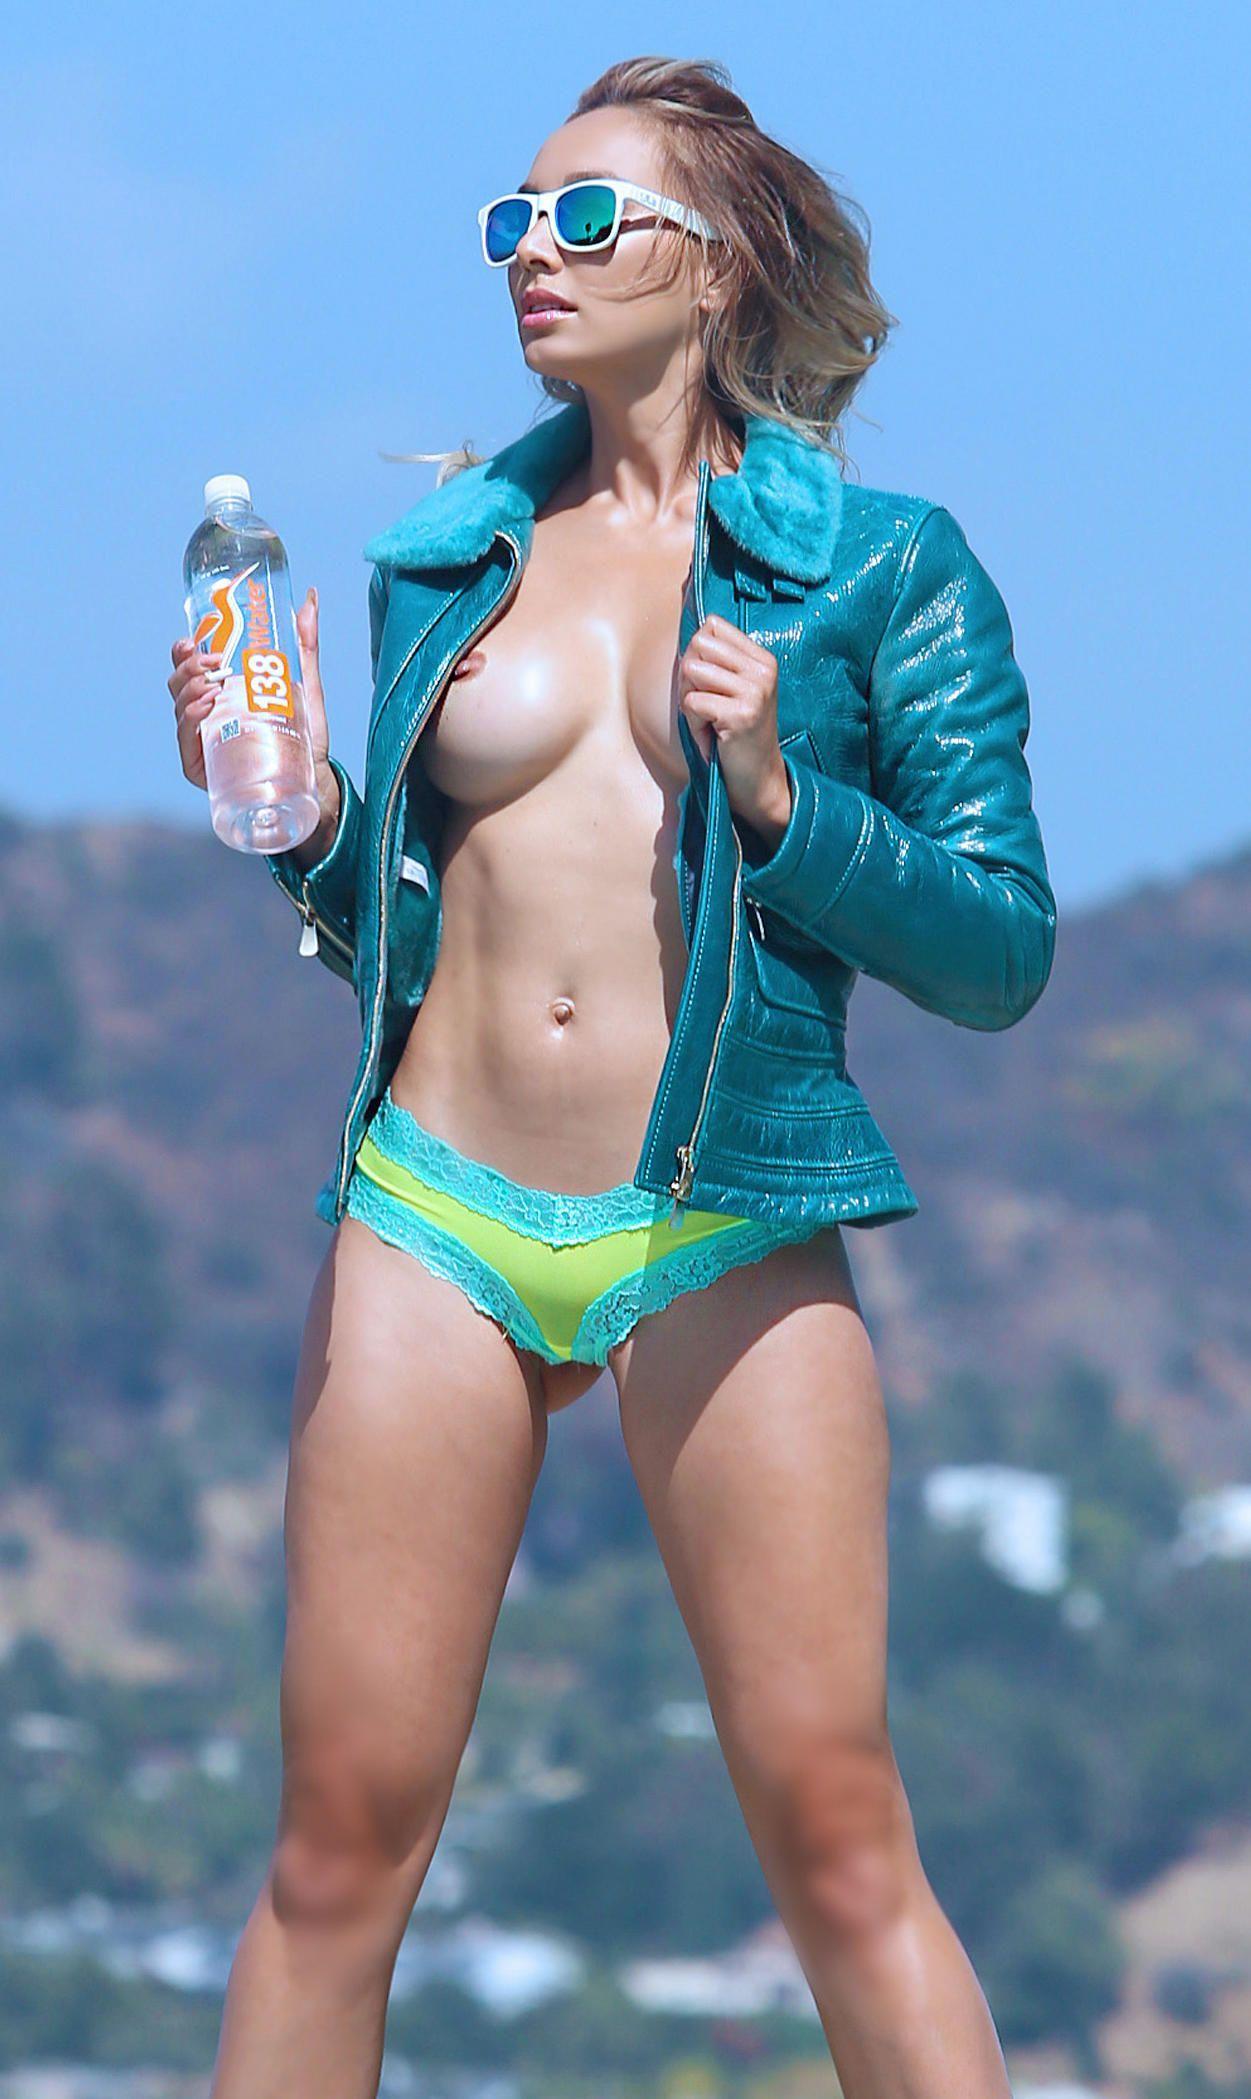 tween topless Nausicaa topless for 138 Water in Bel-Air